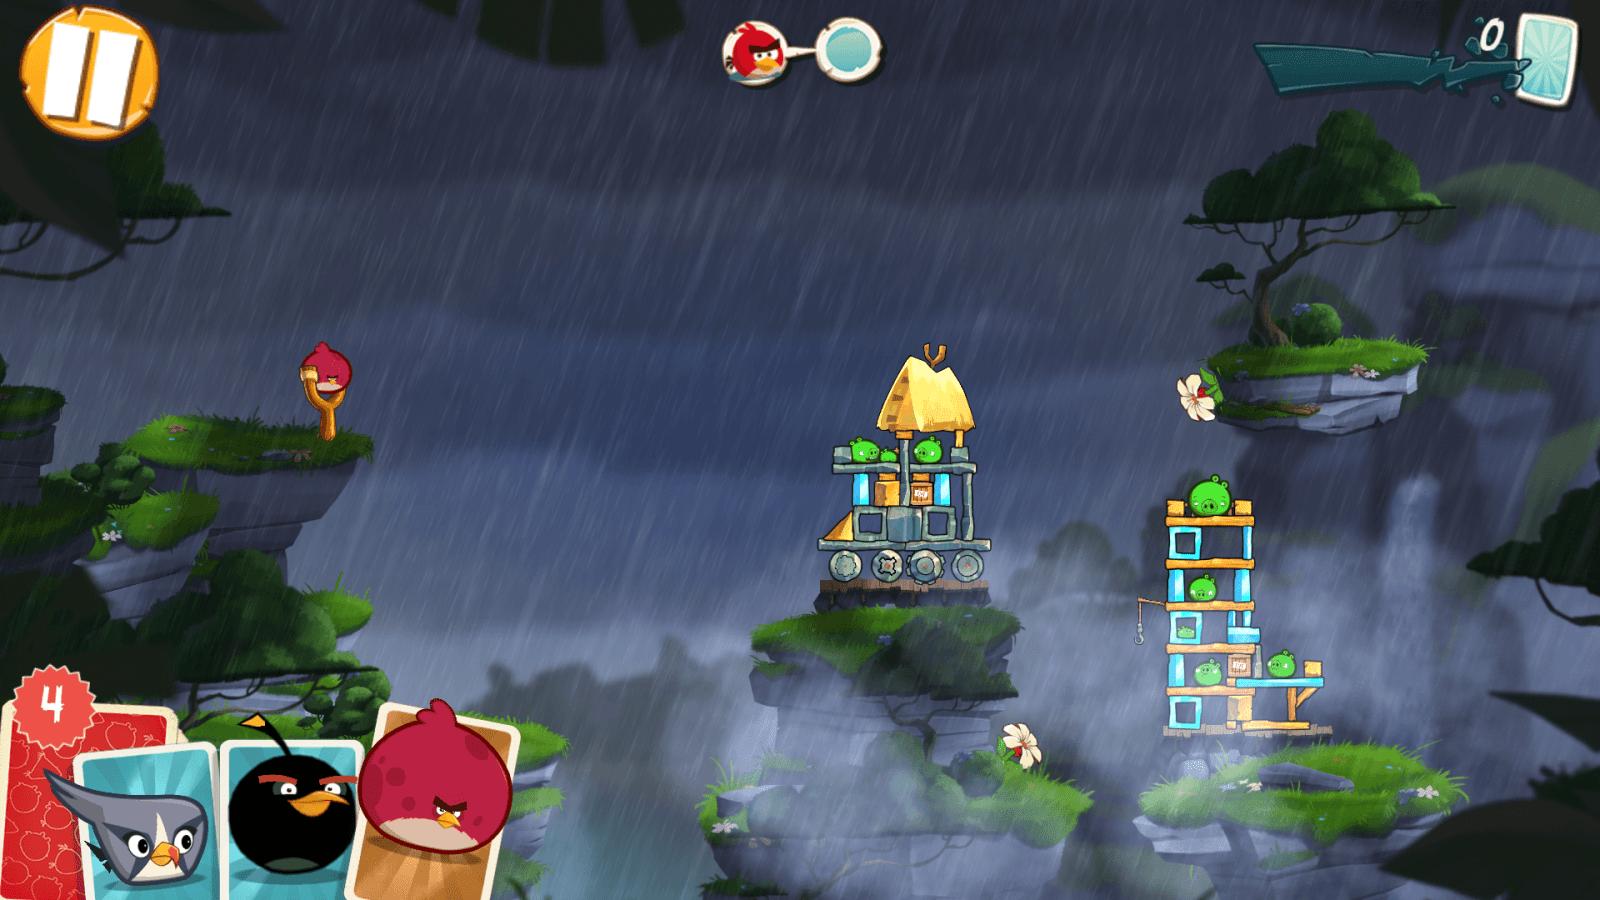 Screenshot 2015 08 19 21 20 14 - Обзор Angry Birds 2